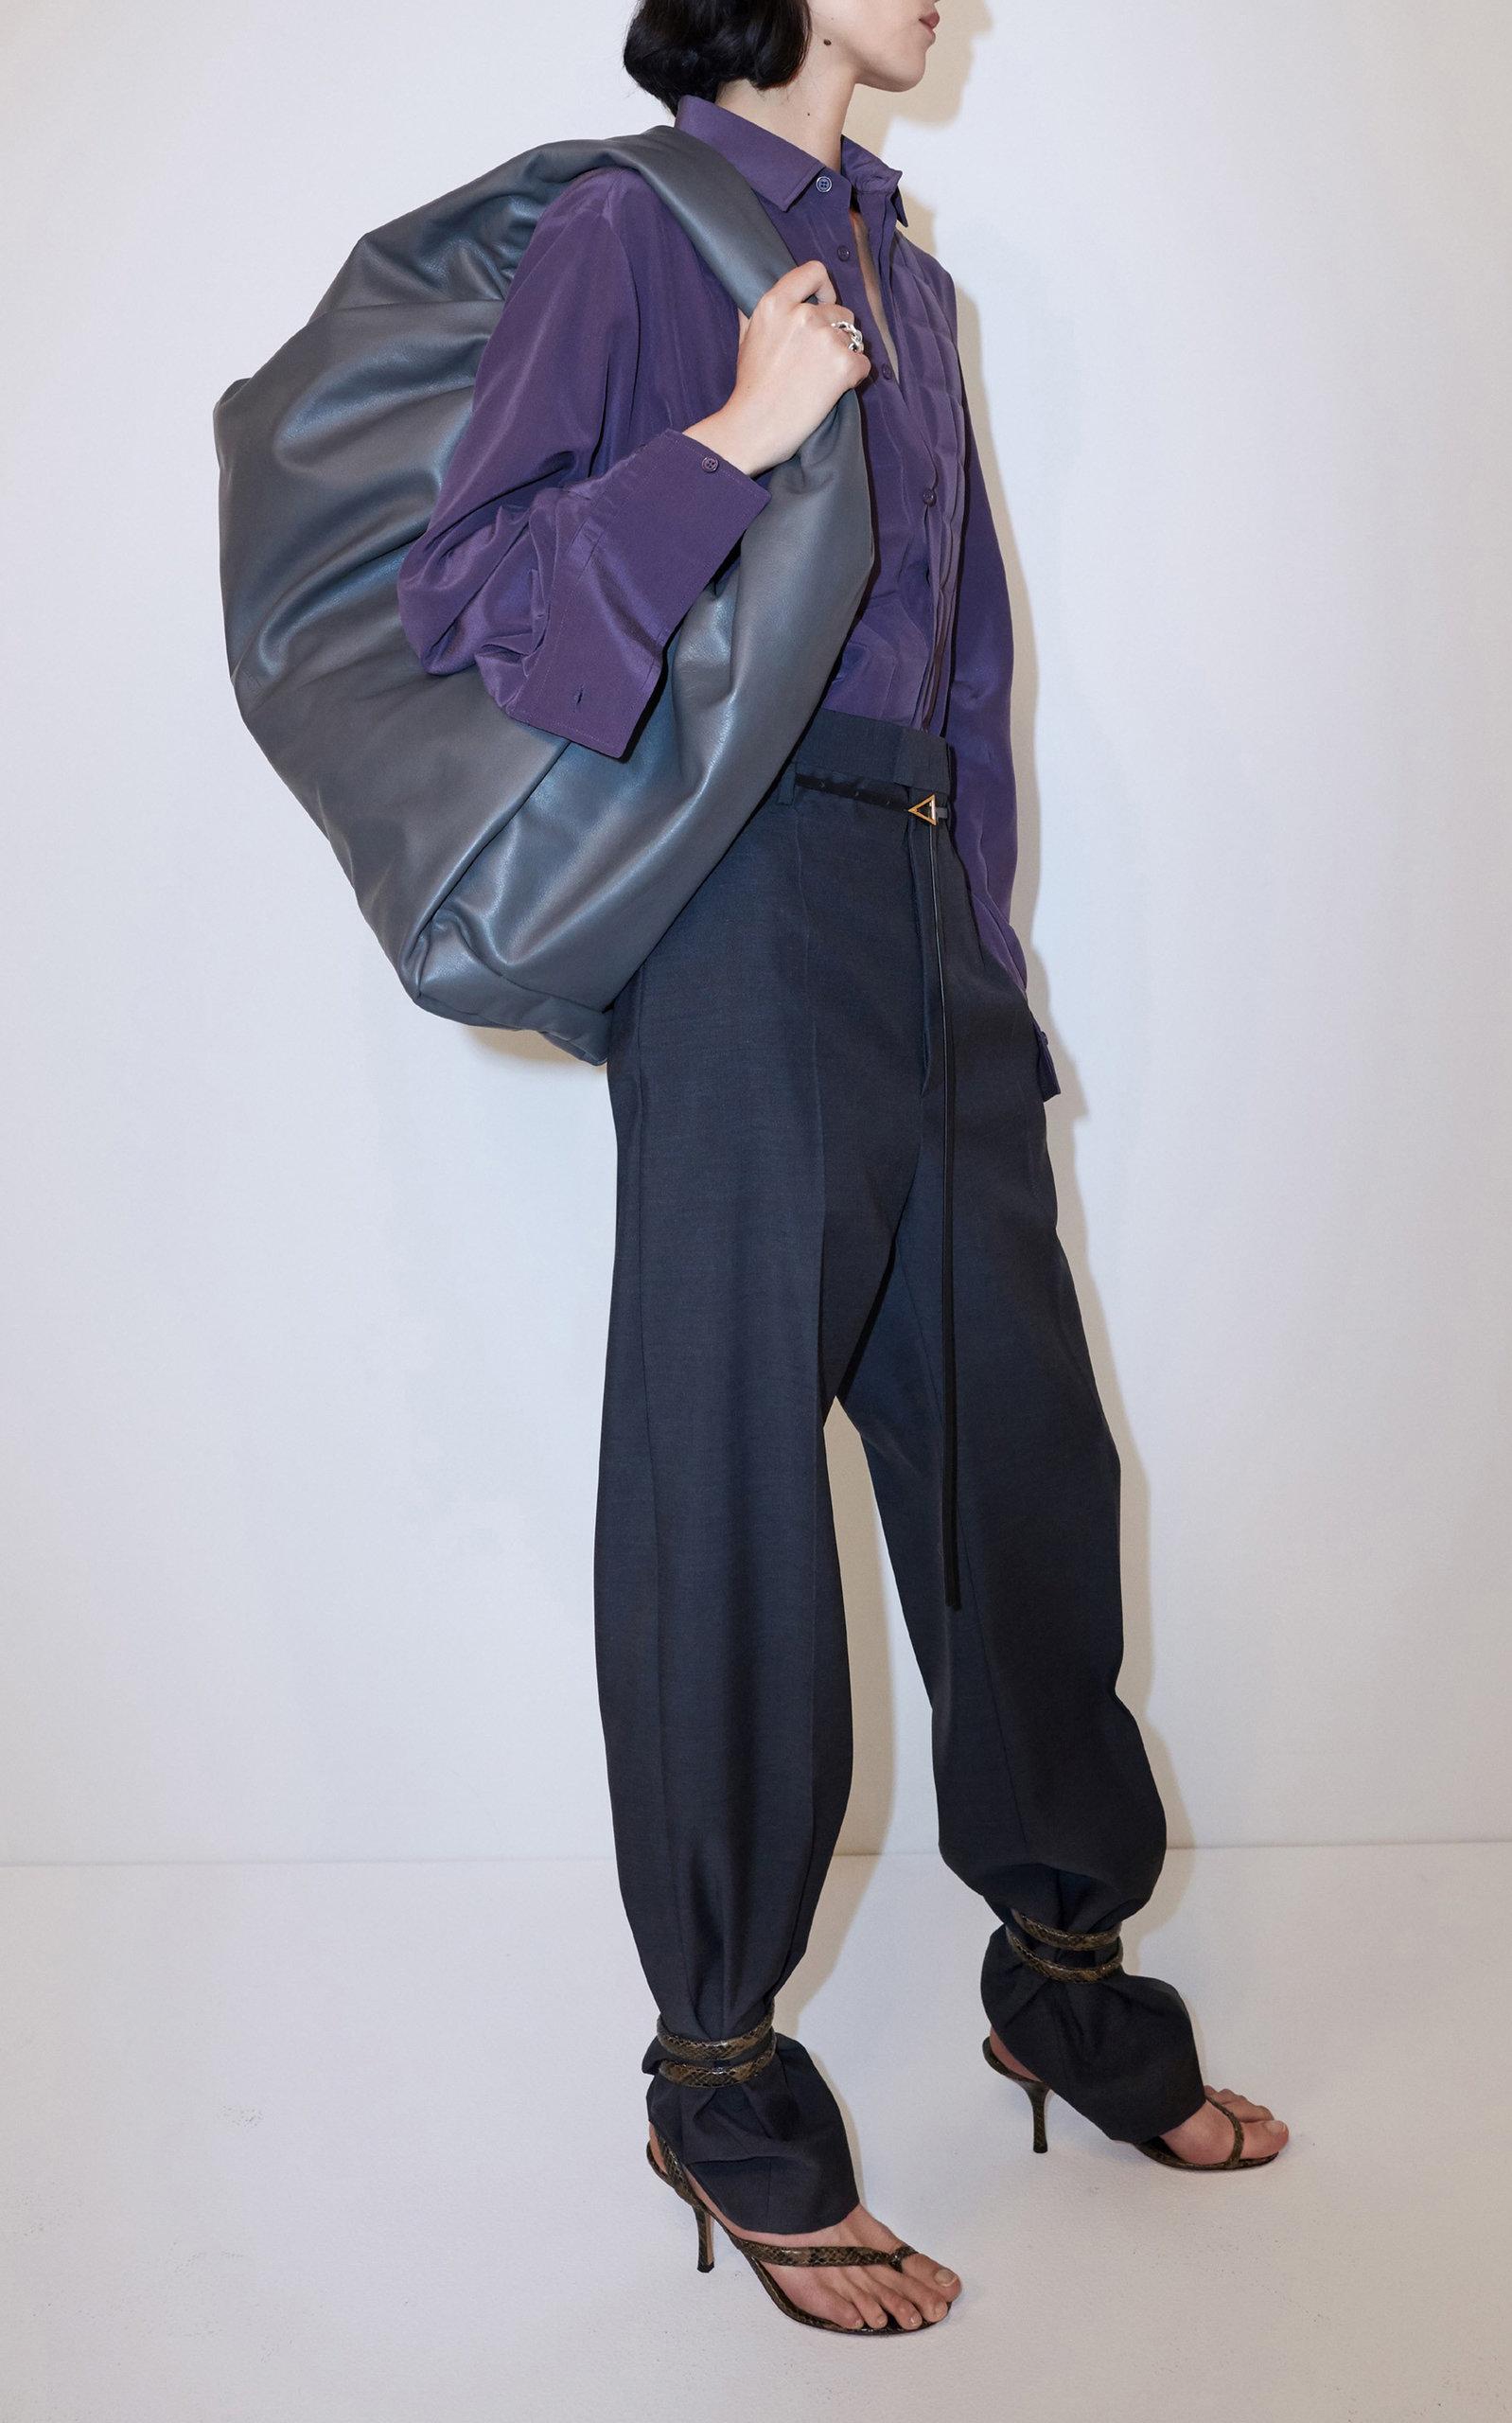 Bottega Veneta - Women's High-Rise Straight-Leg Wool Trouser  - Grey/brown - Moda Operandi